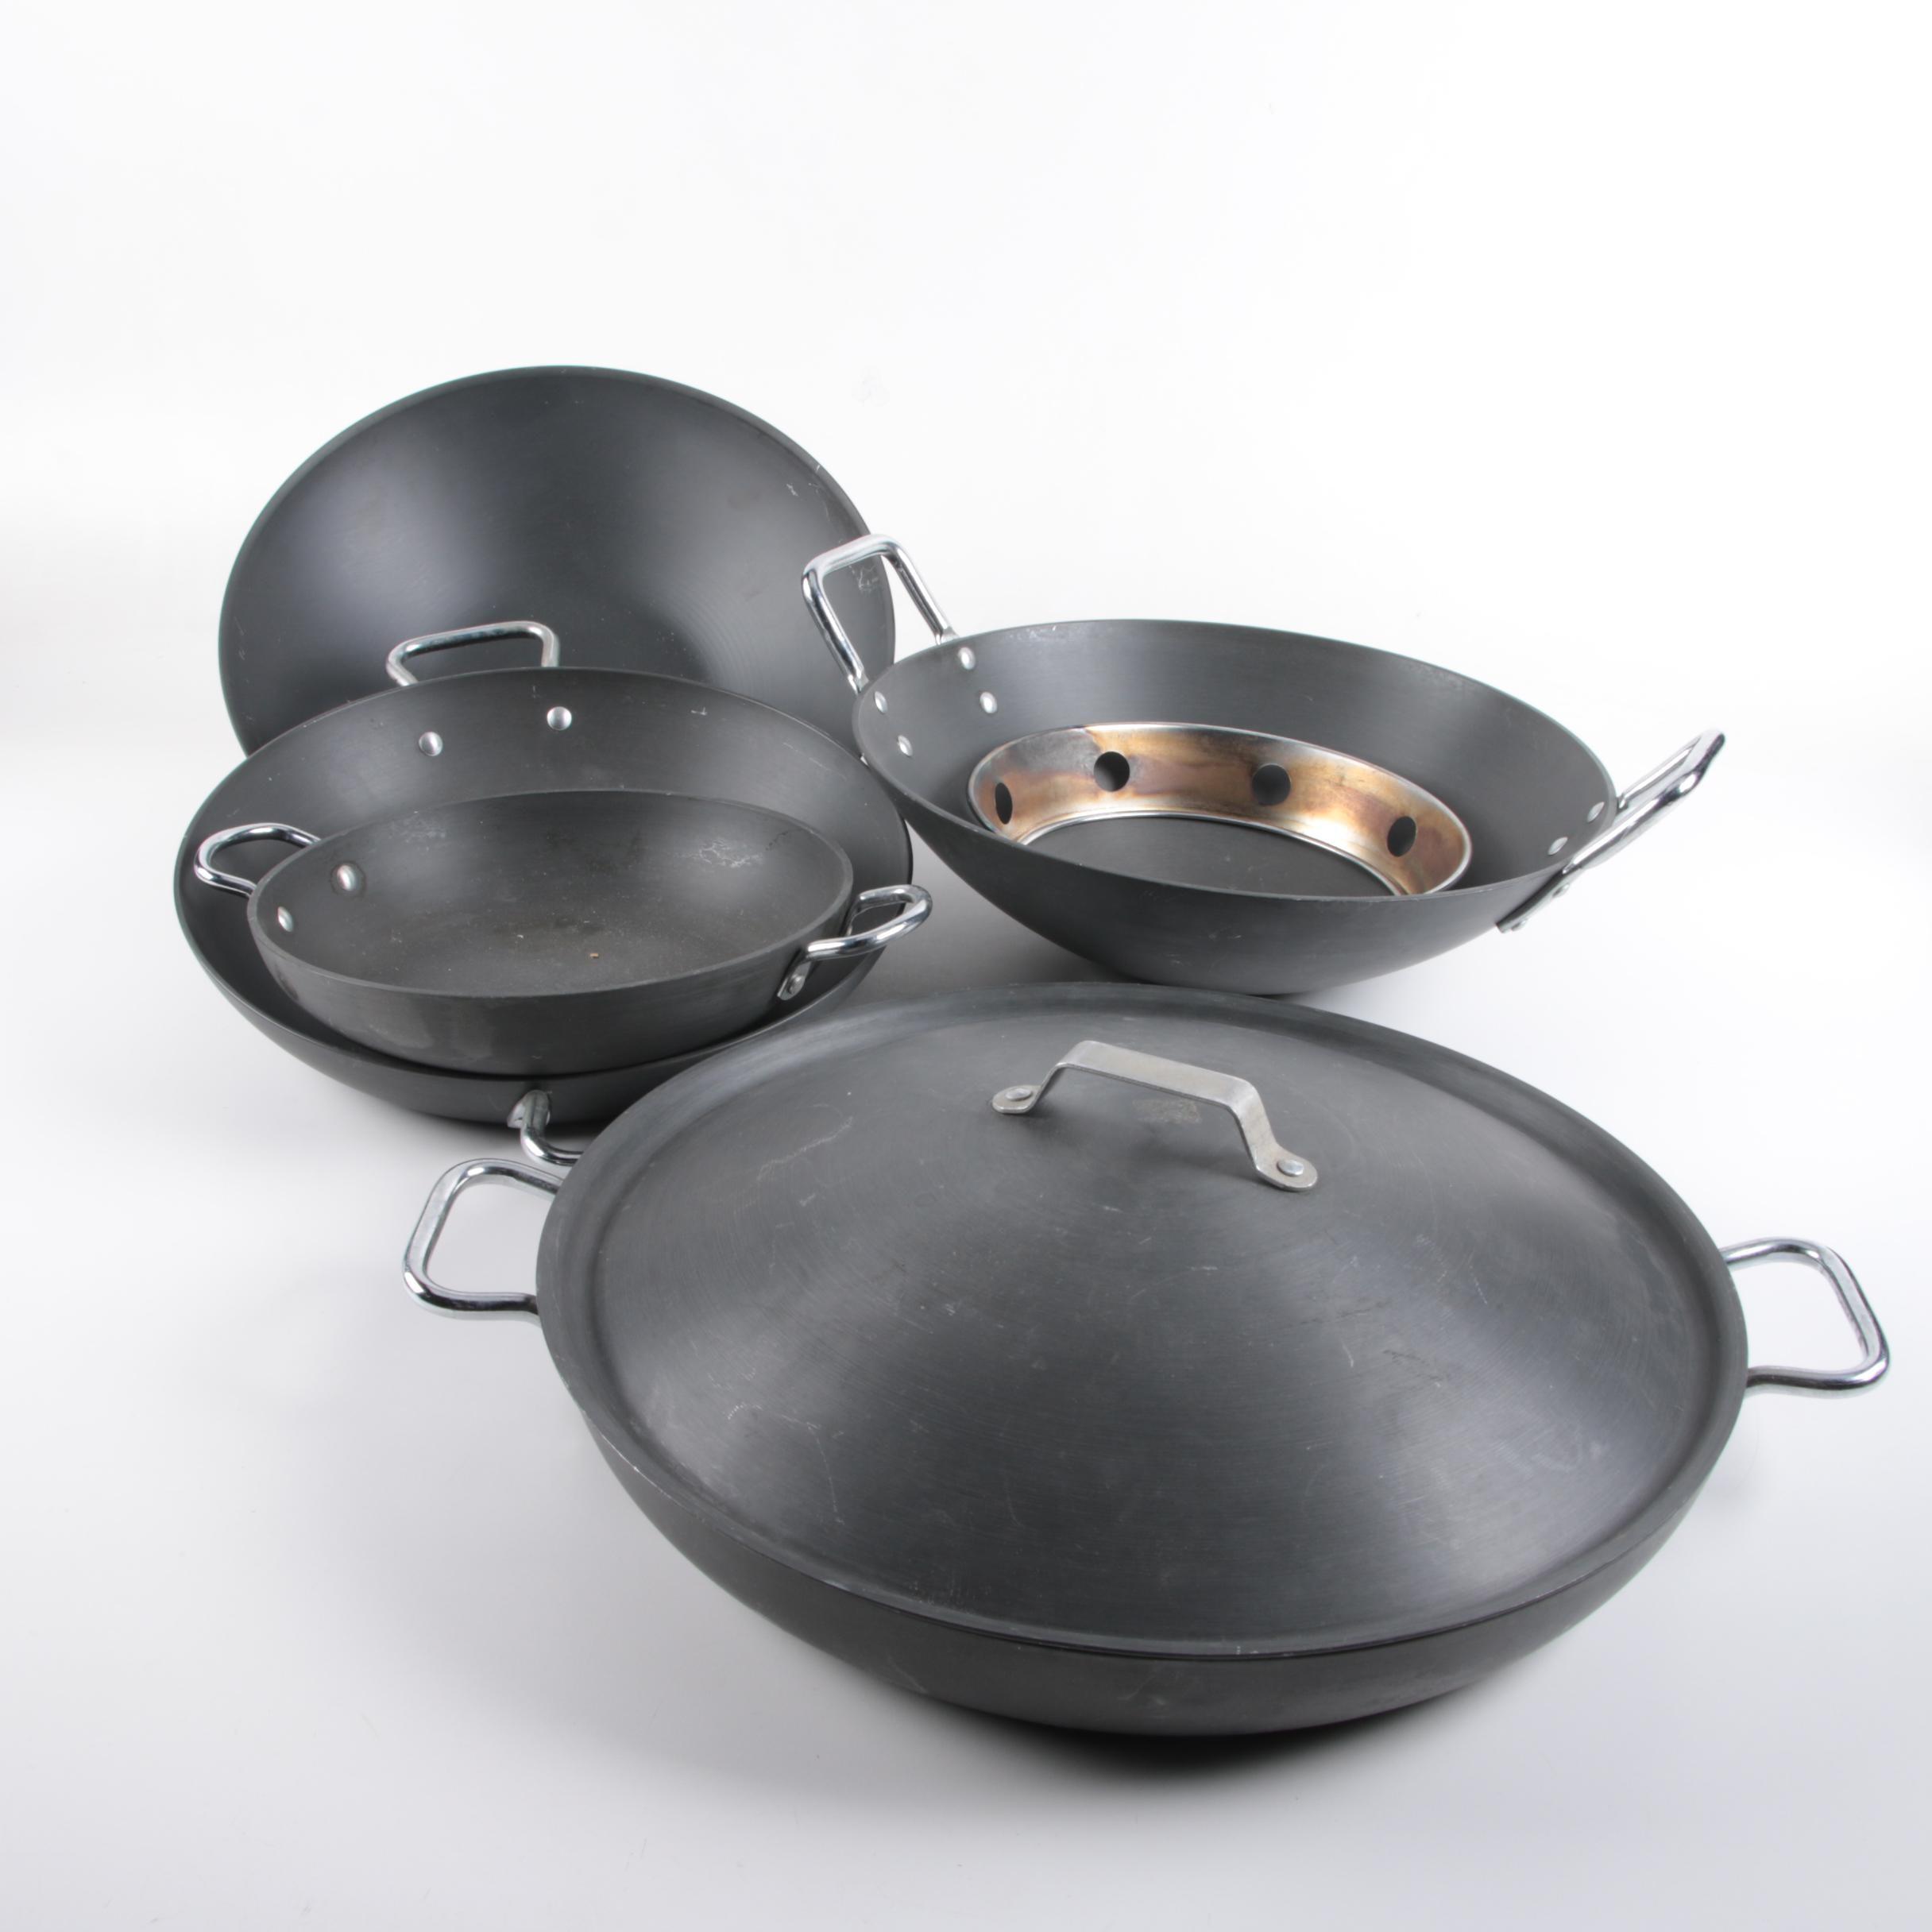 Commercial Aluminum Cookware